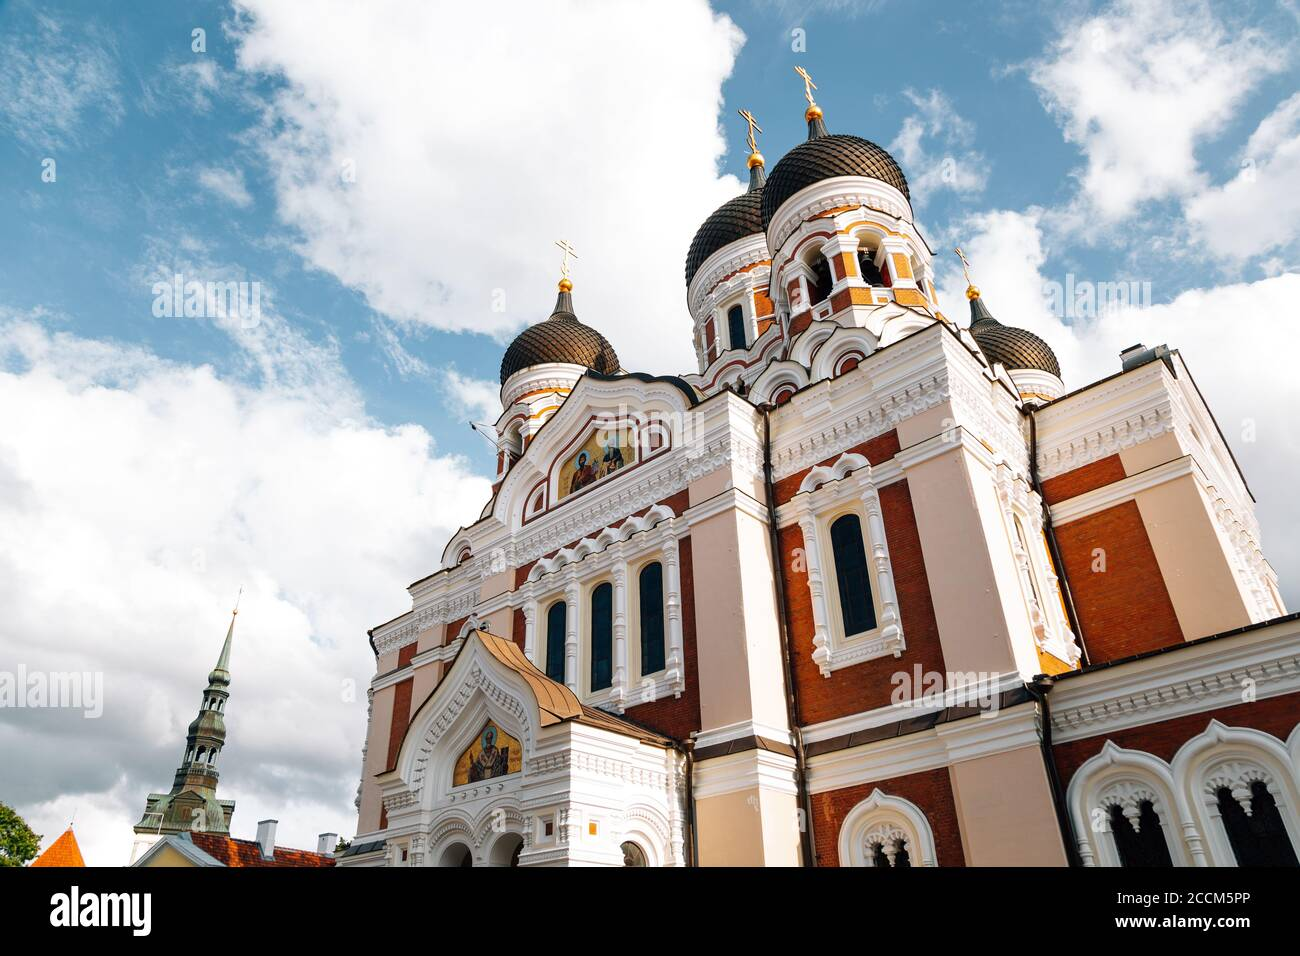 La Cattedrale Alexander Nevsky di Tallinn, Estonia Foto Stock